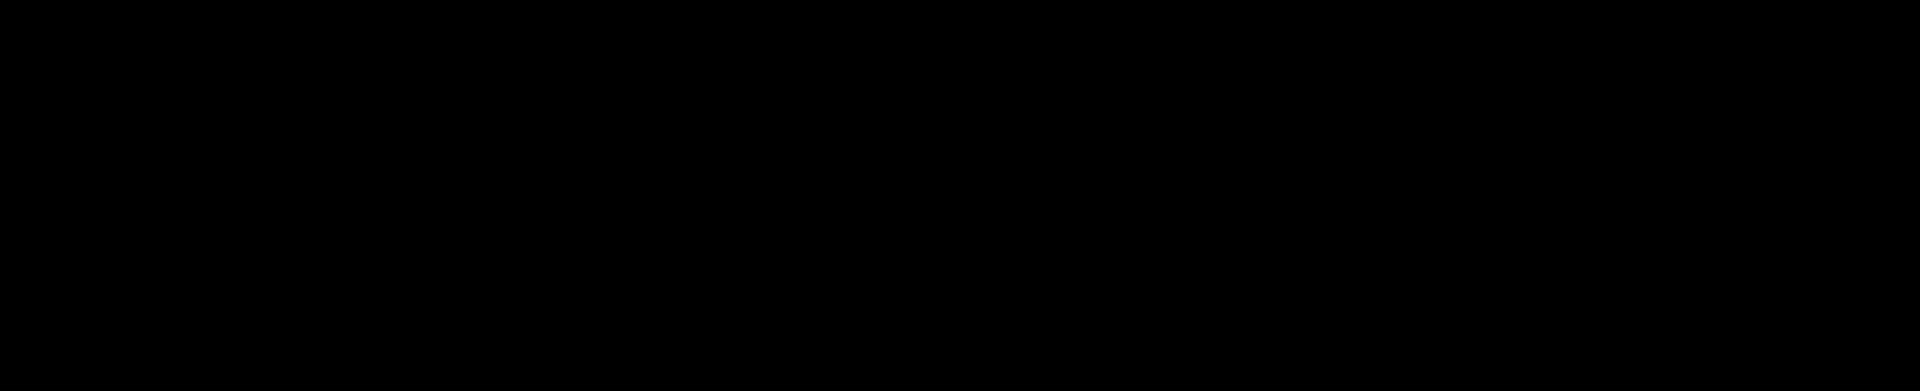 Grimmstar Logo